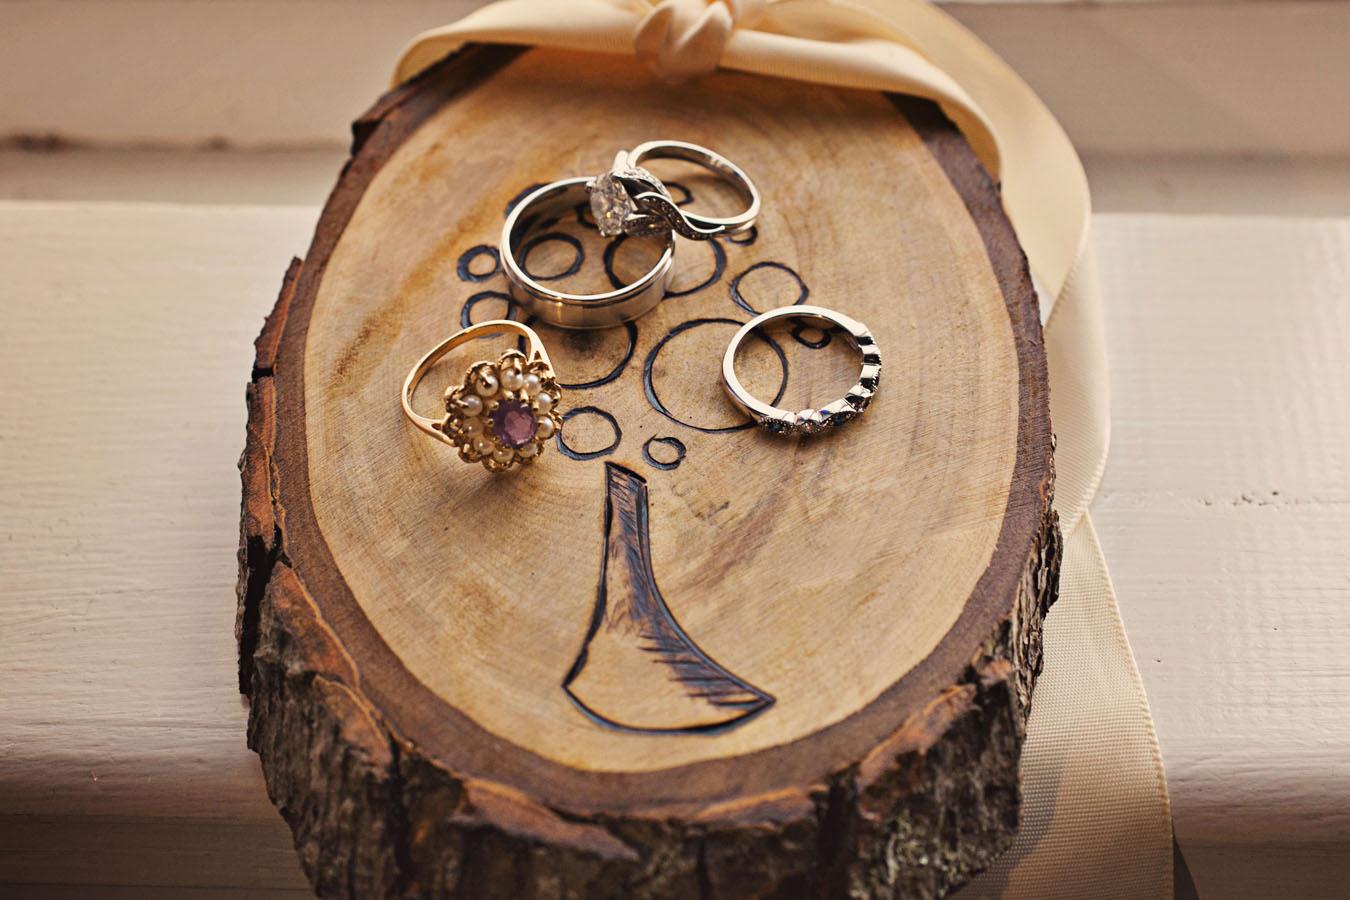 real-texas-wedding-photographers-engagement-ring-wedding-band.original ...